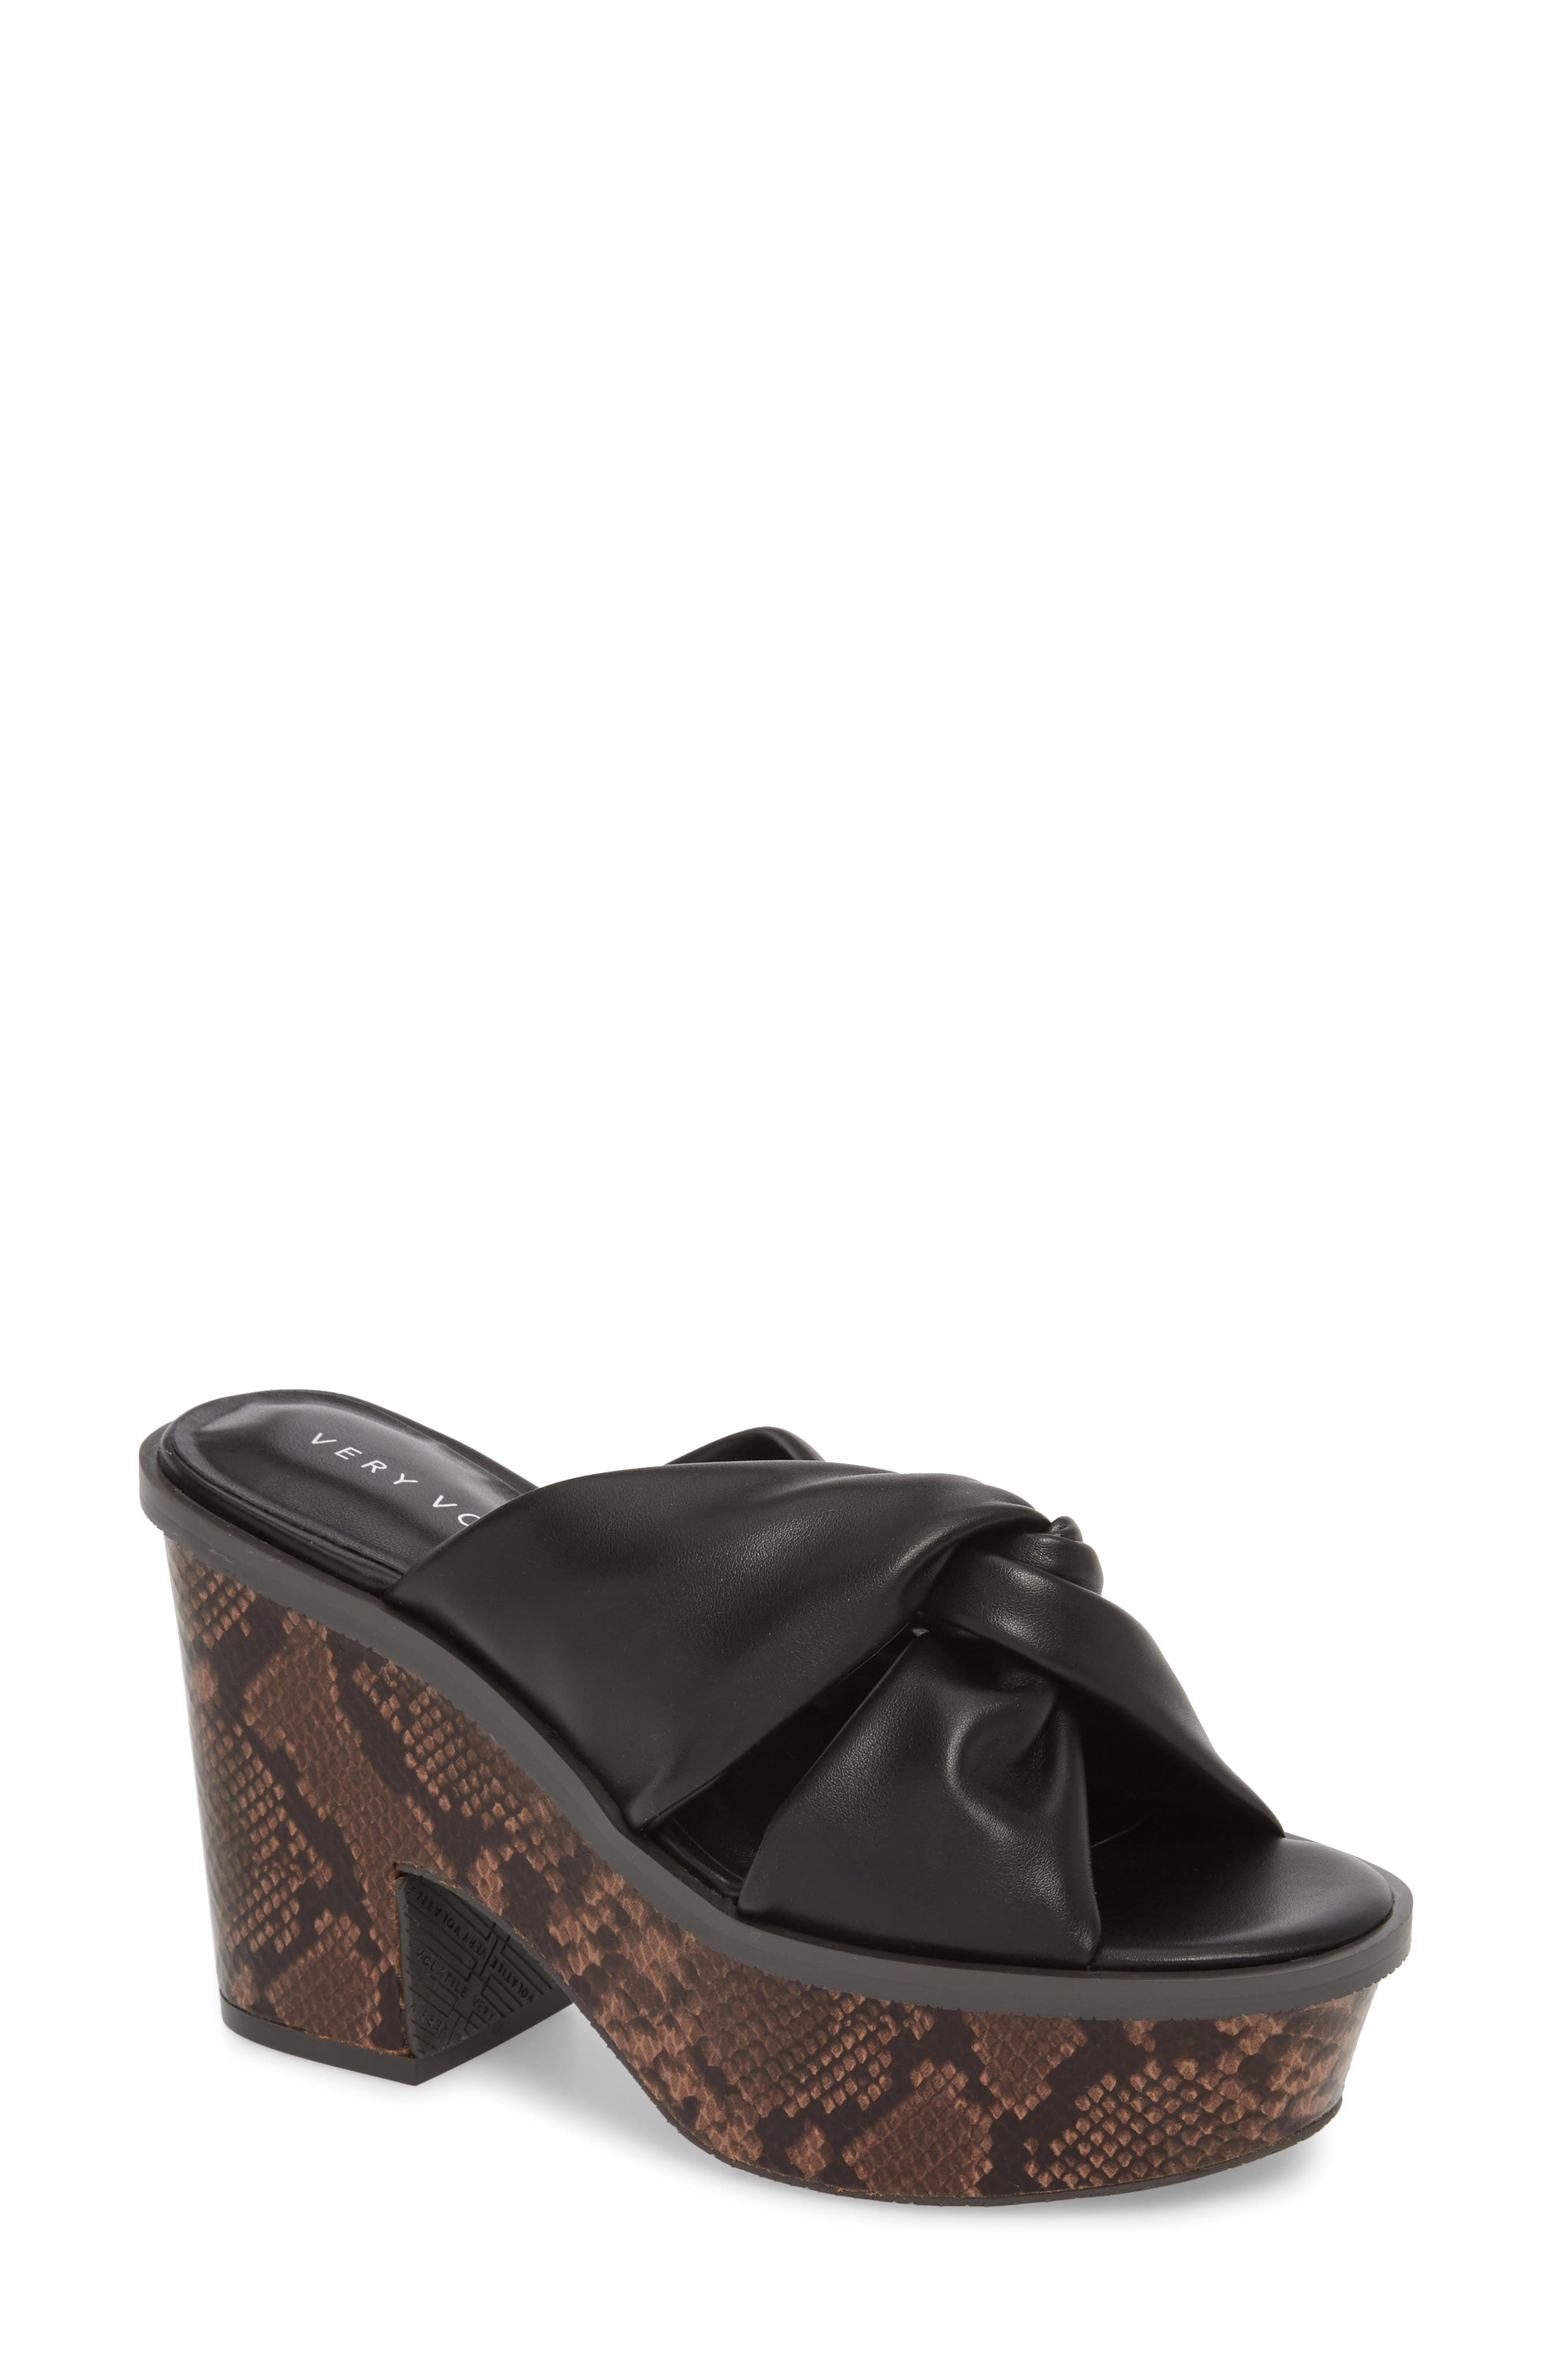 Ainsley Platform Sandal,                             Main thumbnail 1, color,                             Black